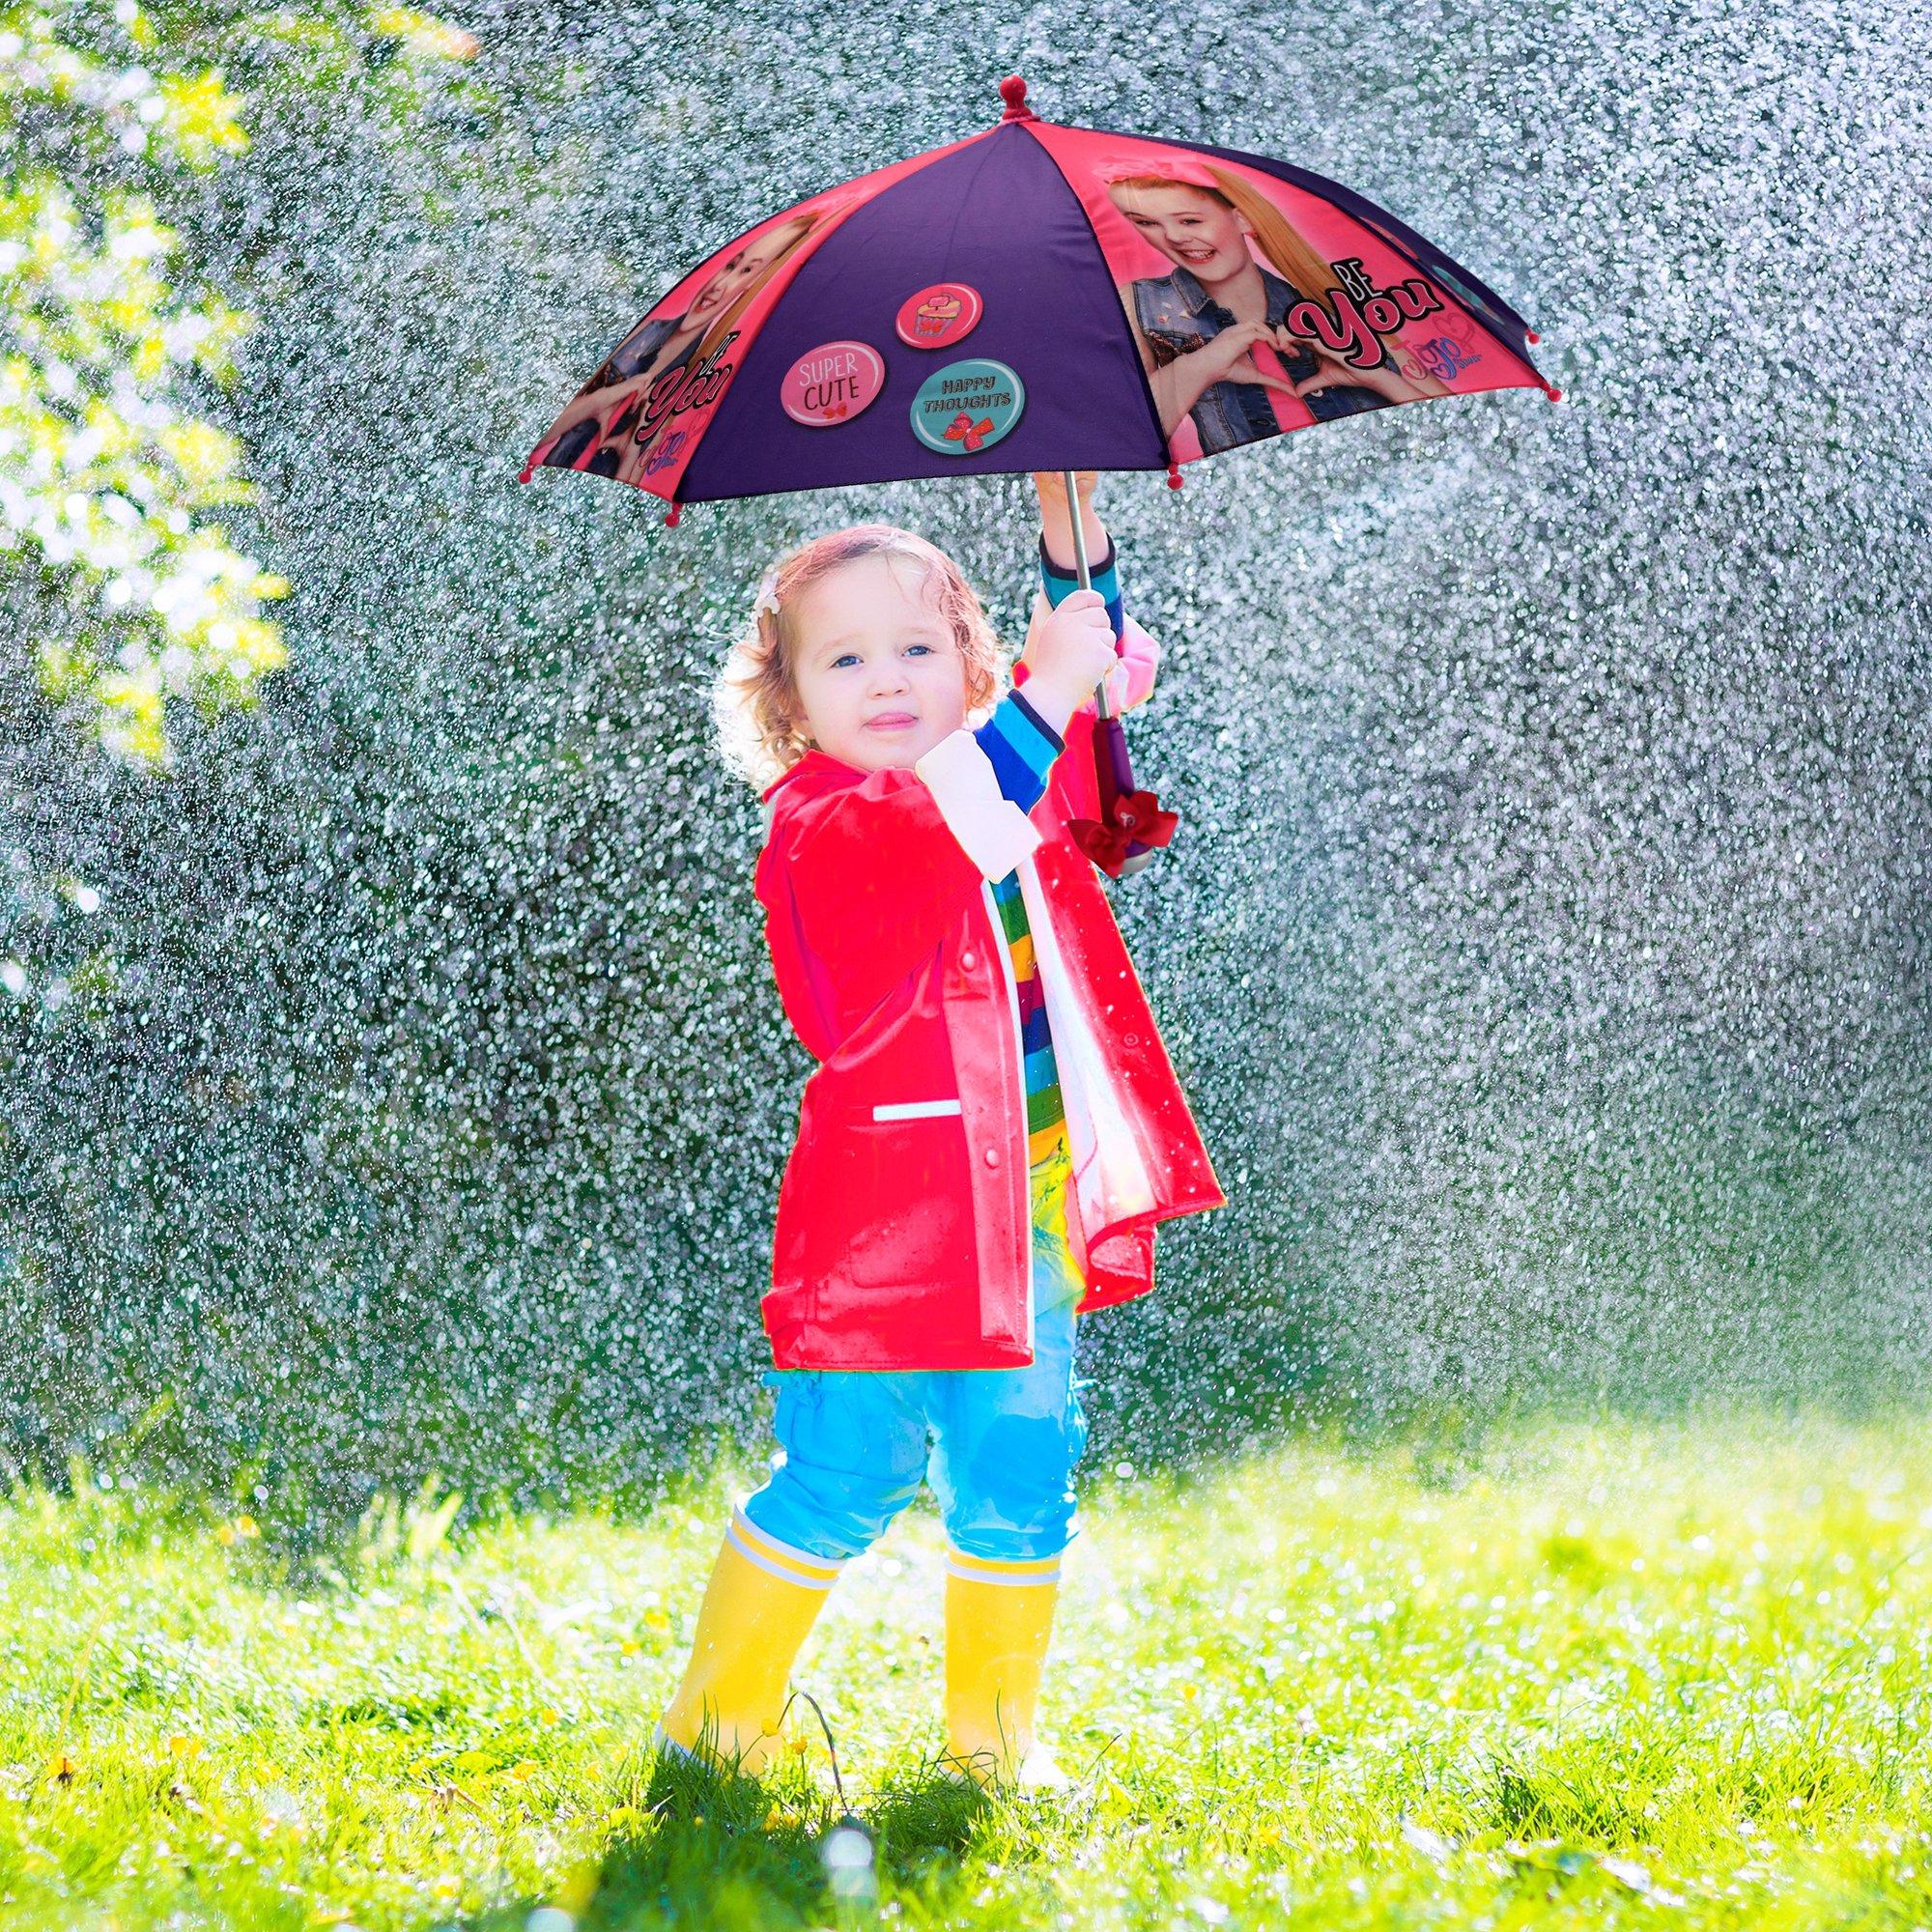 Nickelodeon Little Girls' Jojo Siwa Rainwear Character Umbrella, Purple/Pink, Age 3-7 by Nickelodeon (Image #3)